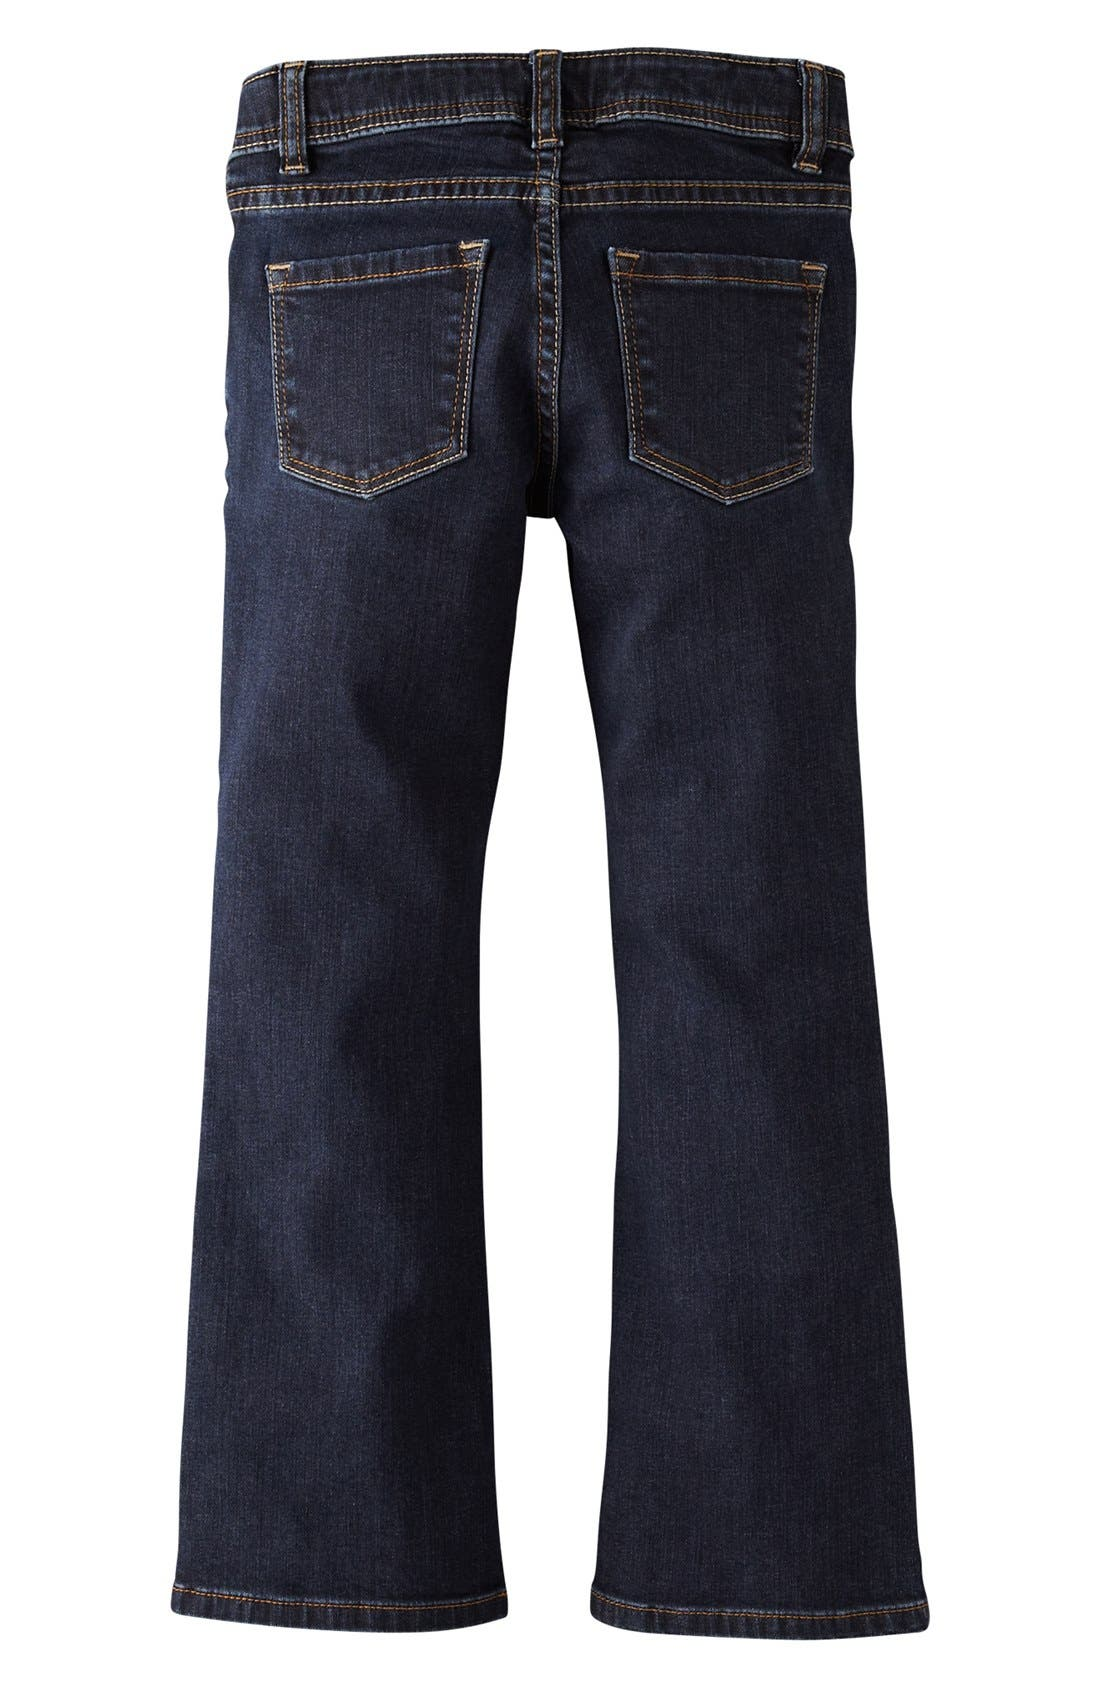 Alternate Image 1 Selected - Mini Boden Bootcut Jeans (Little Girls & Big Girls)